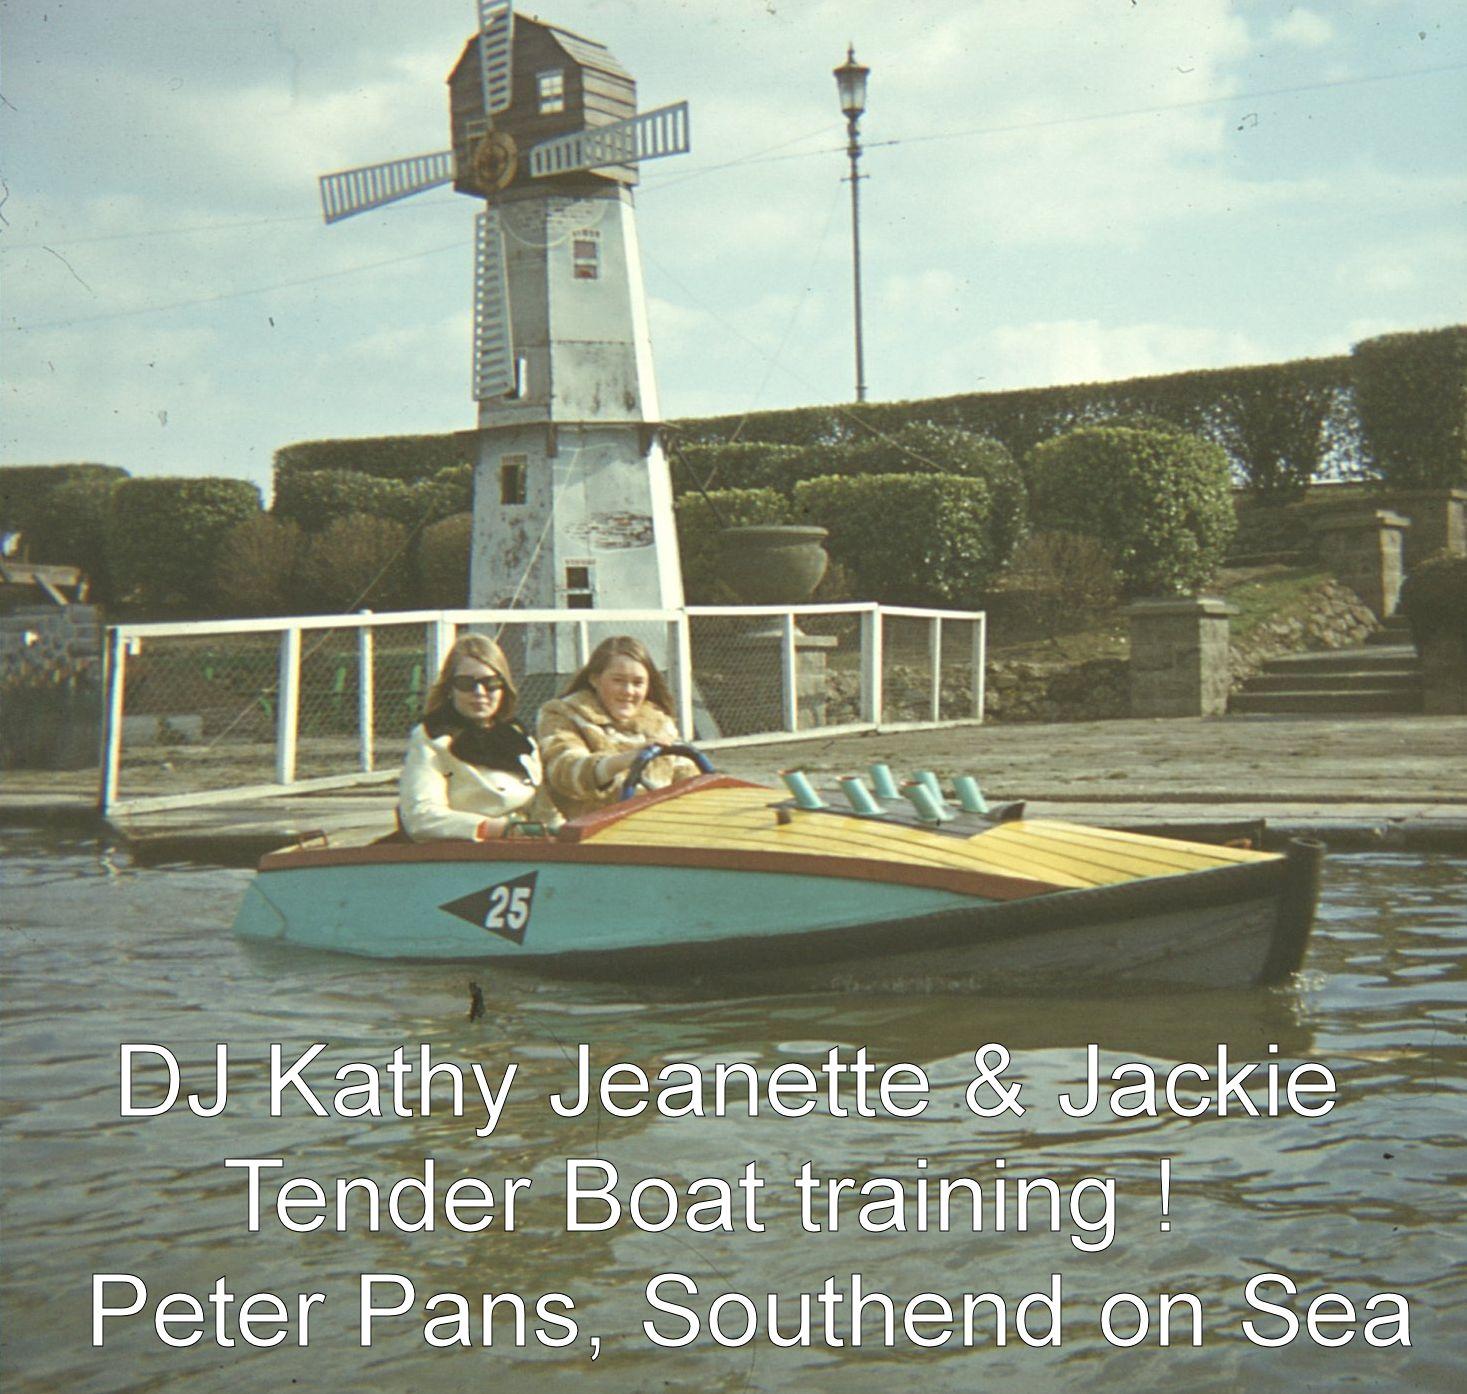 DJ Kathy Jeanette & Jackie 1970